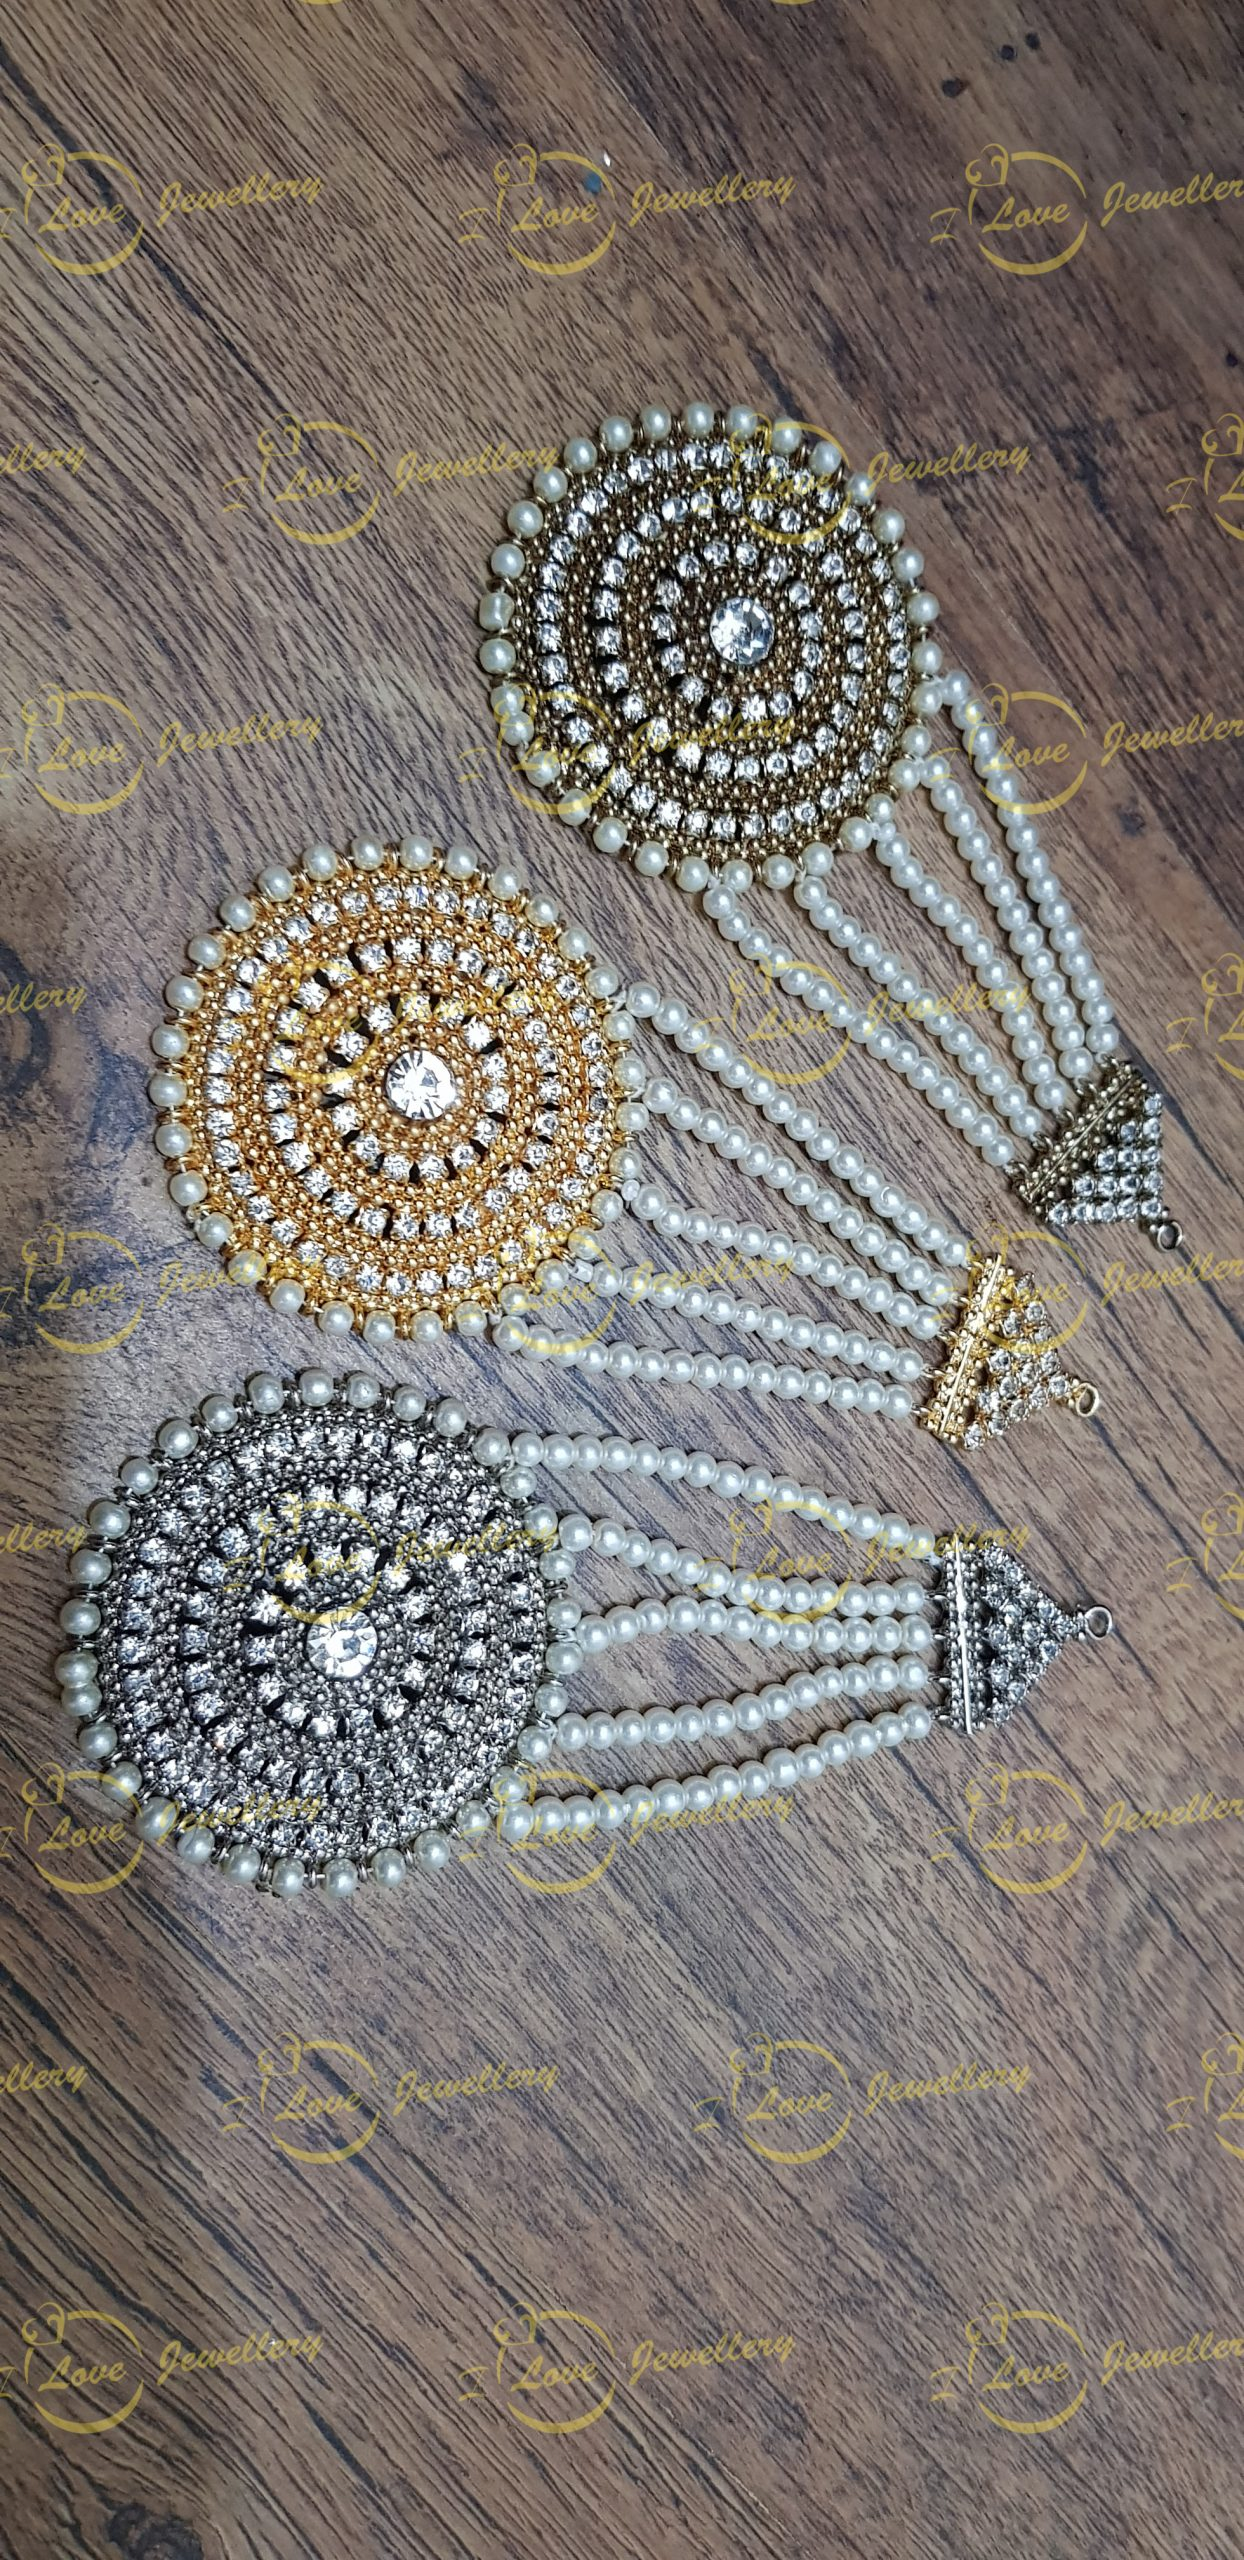 golden Jhoomar - silver jhoomar - antique jhoomar - wholesale Pakistani jewellery - bespoke Pakistani jewellery